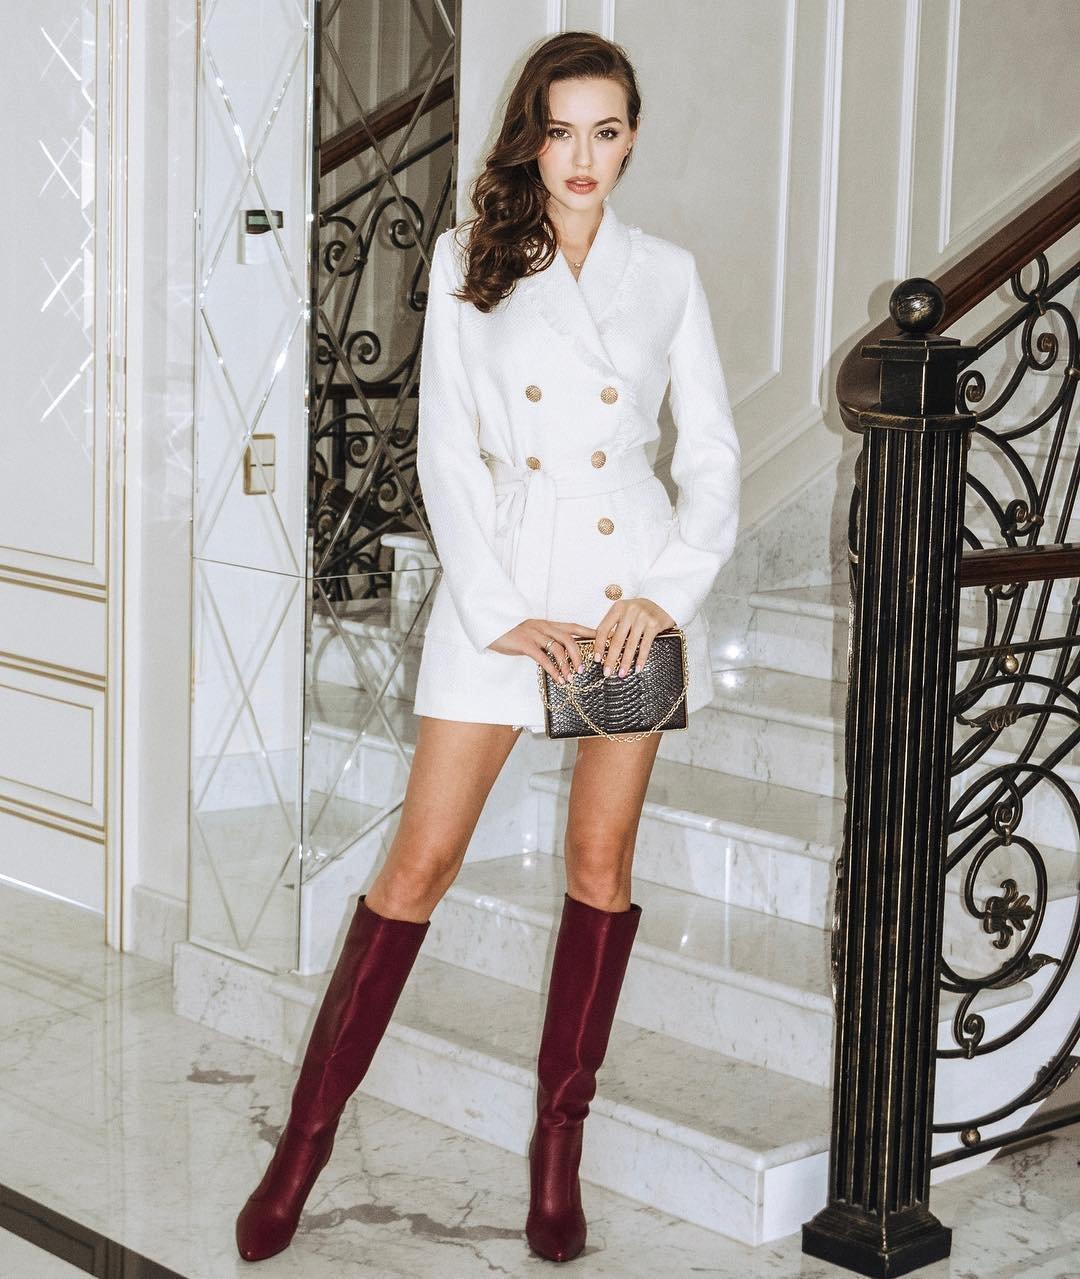 Анастасия Костенко упрекнула мужчин, которые жалеют денег на женщин